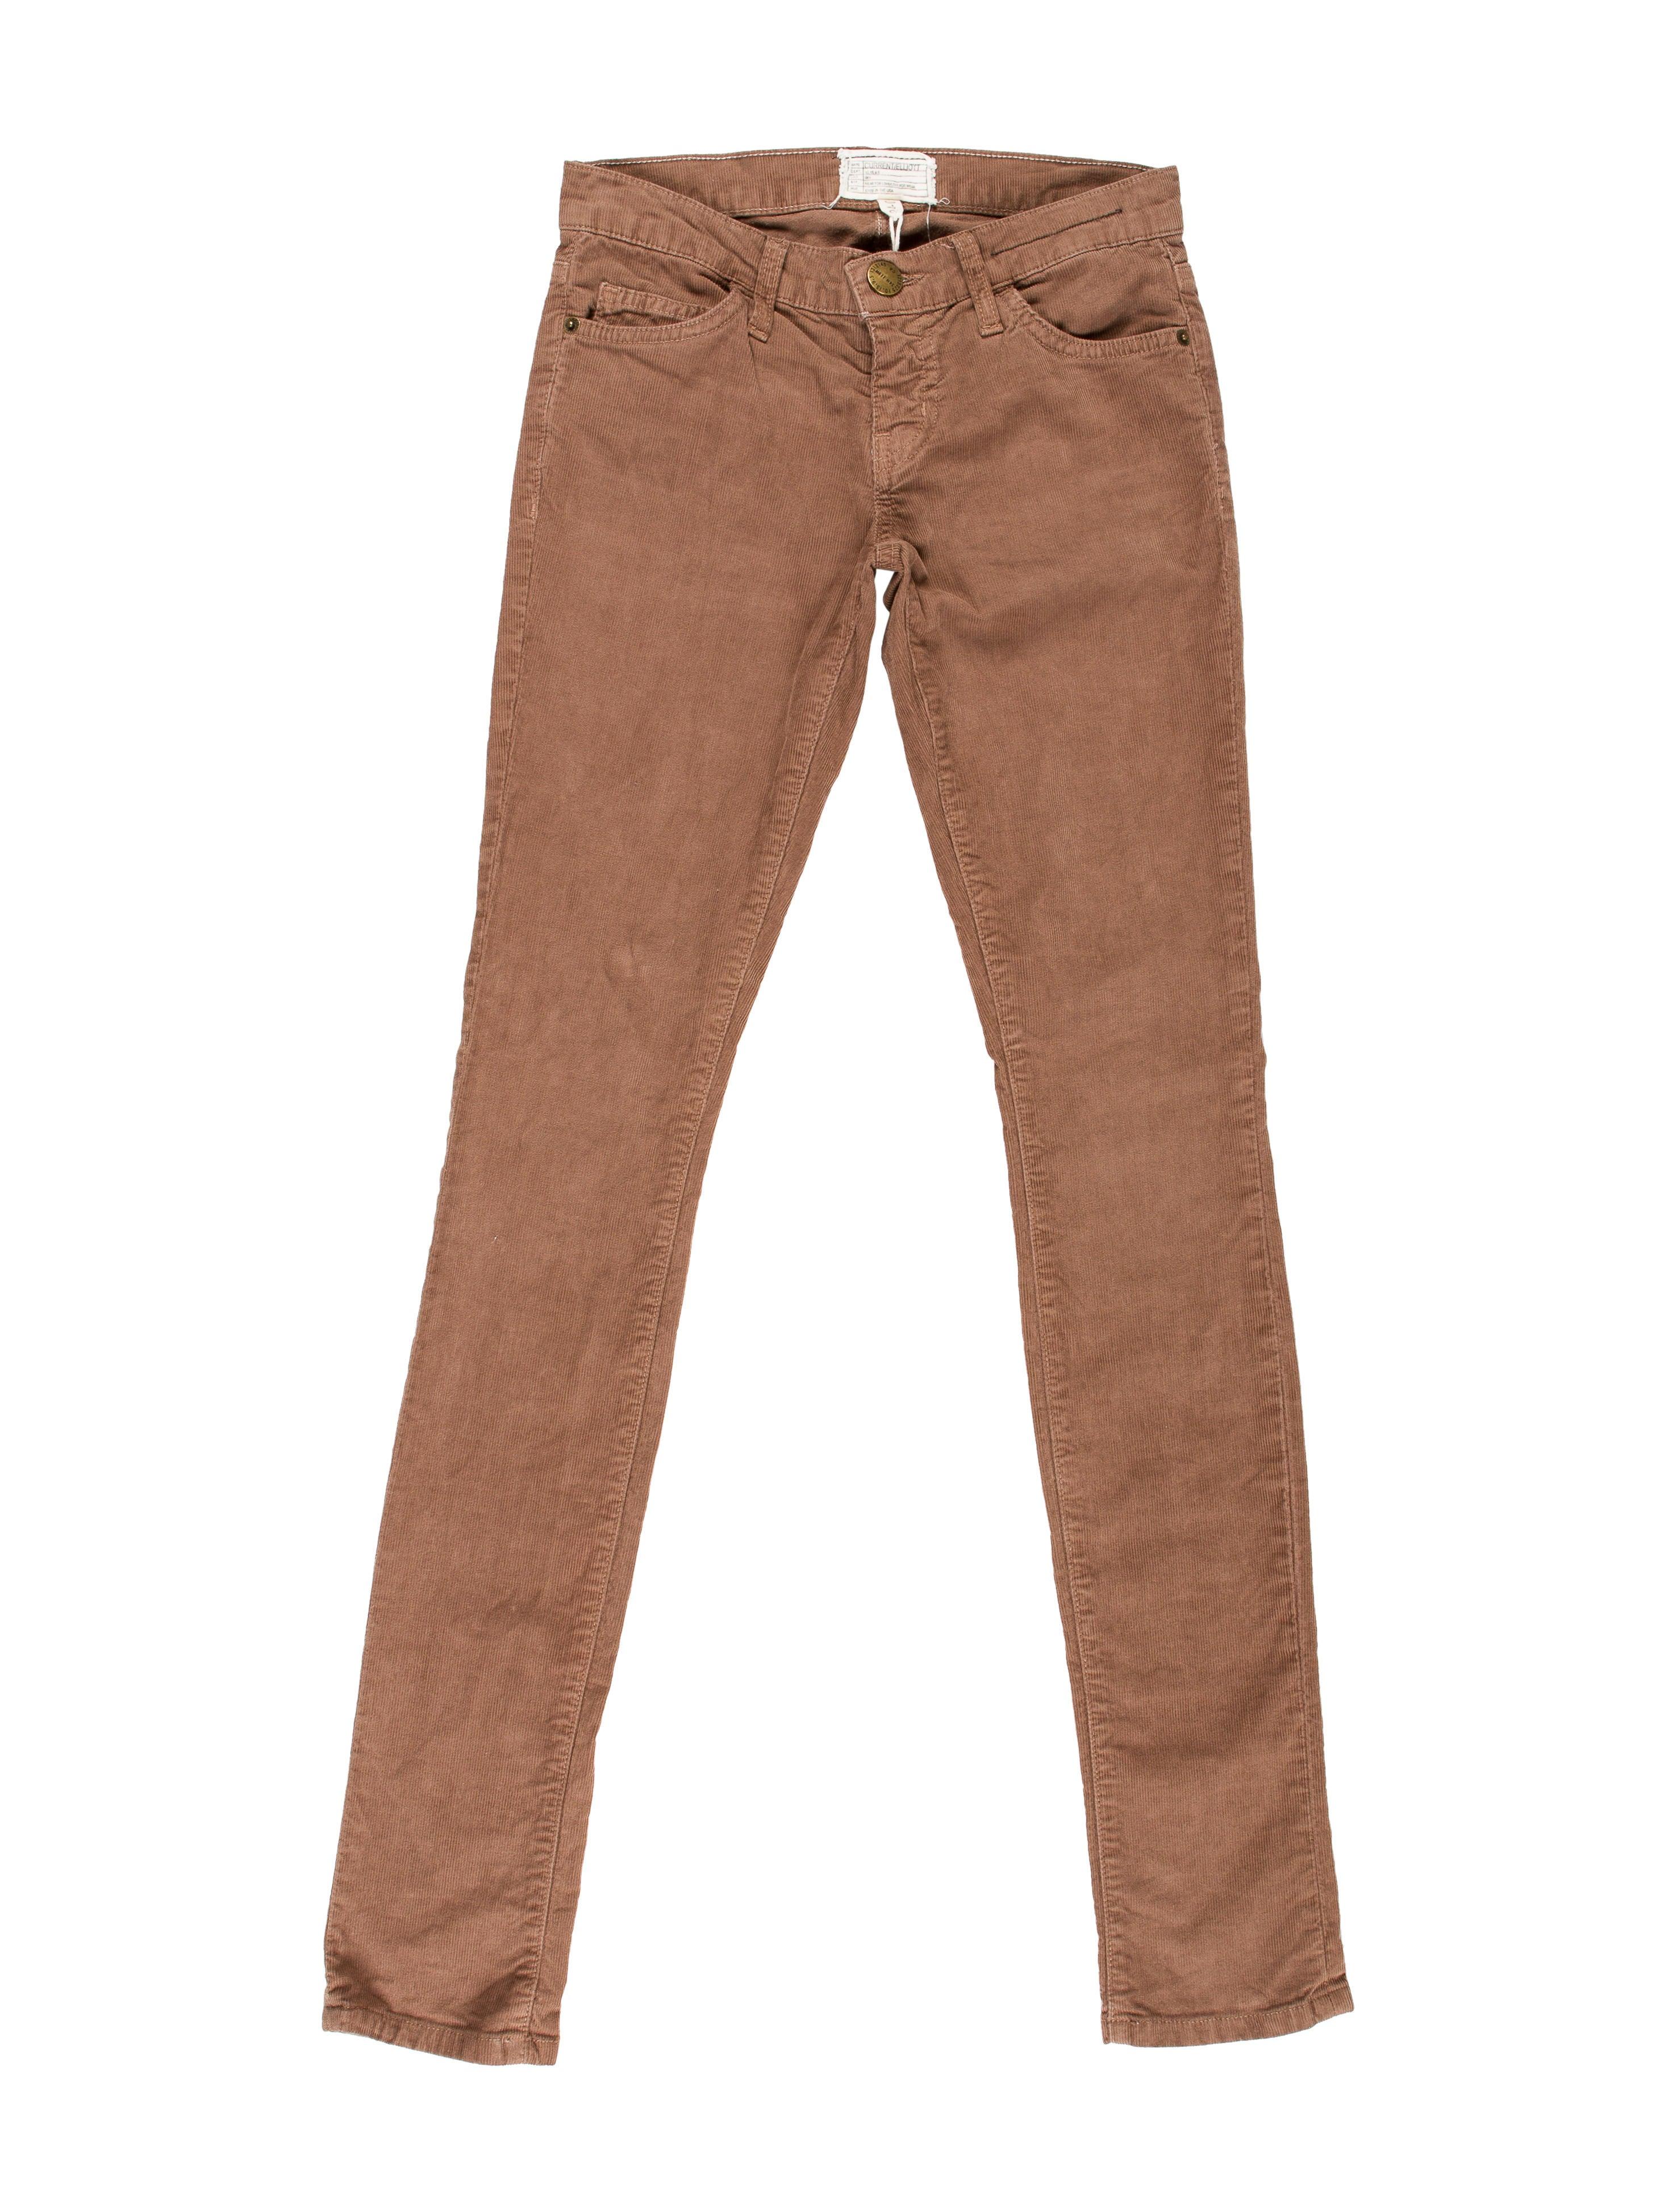 Lastest Vince Second Skin Skinny Corduroy Pants In Beige Camel  Lyst